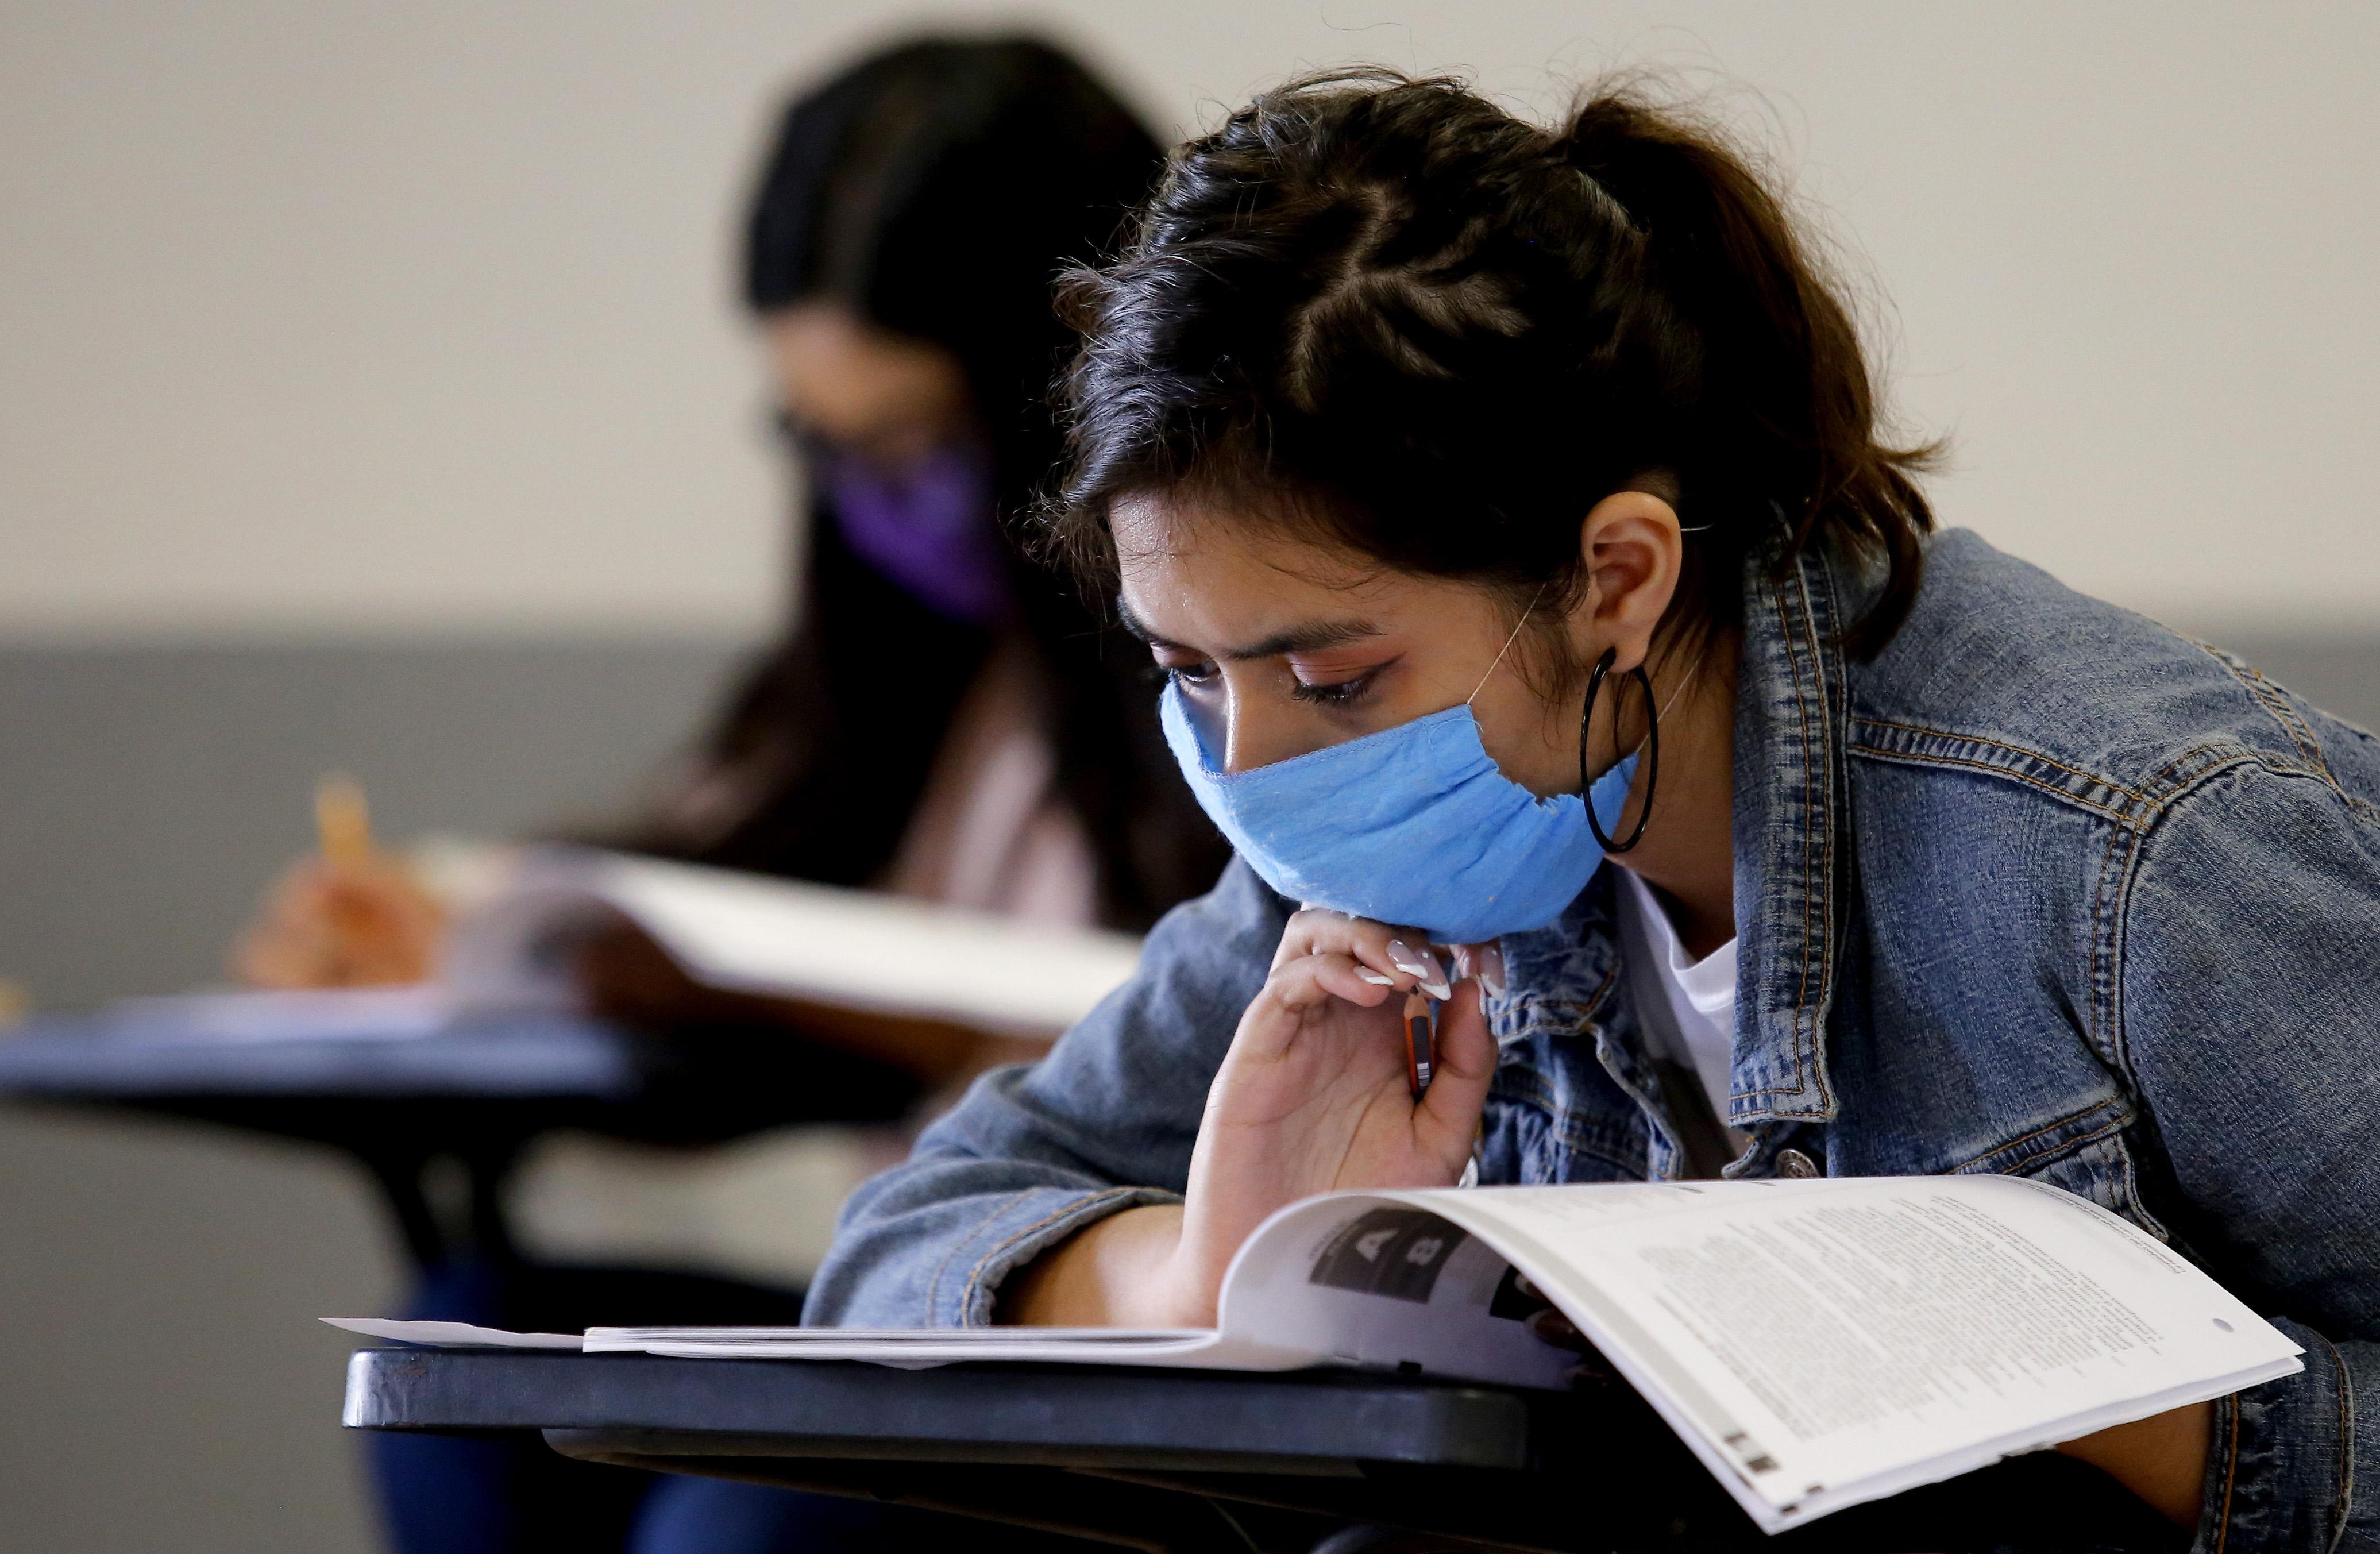 Australian universities offer international students tuition rebates